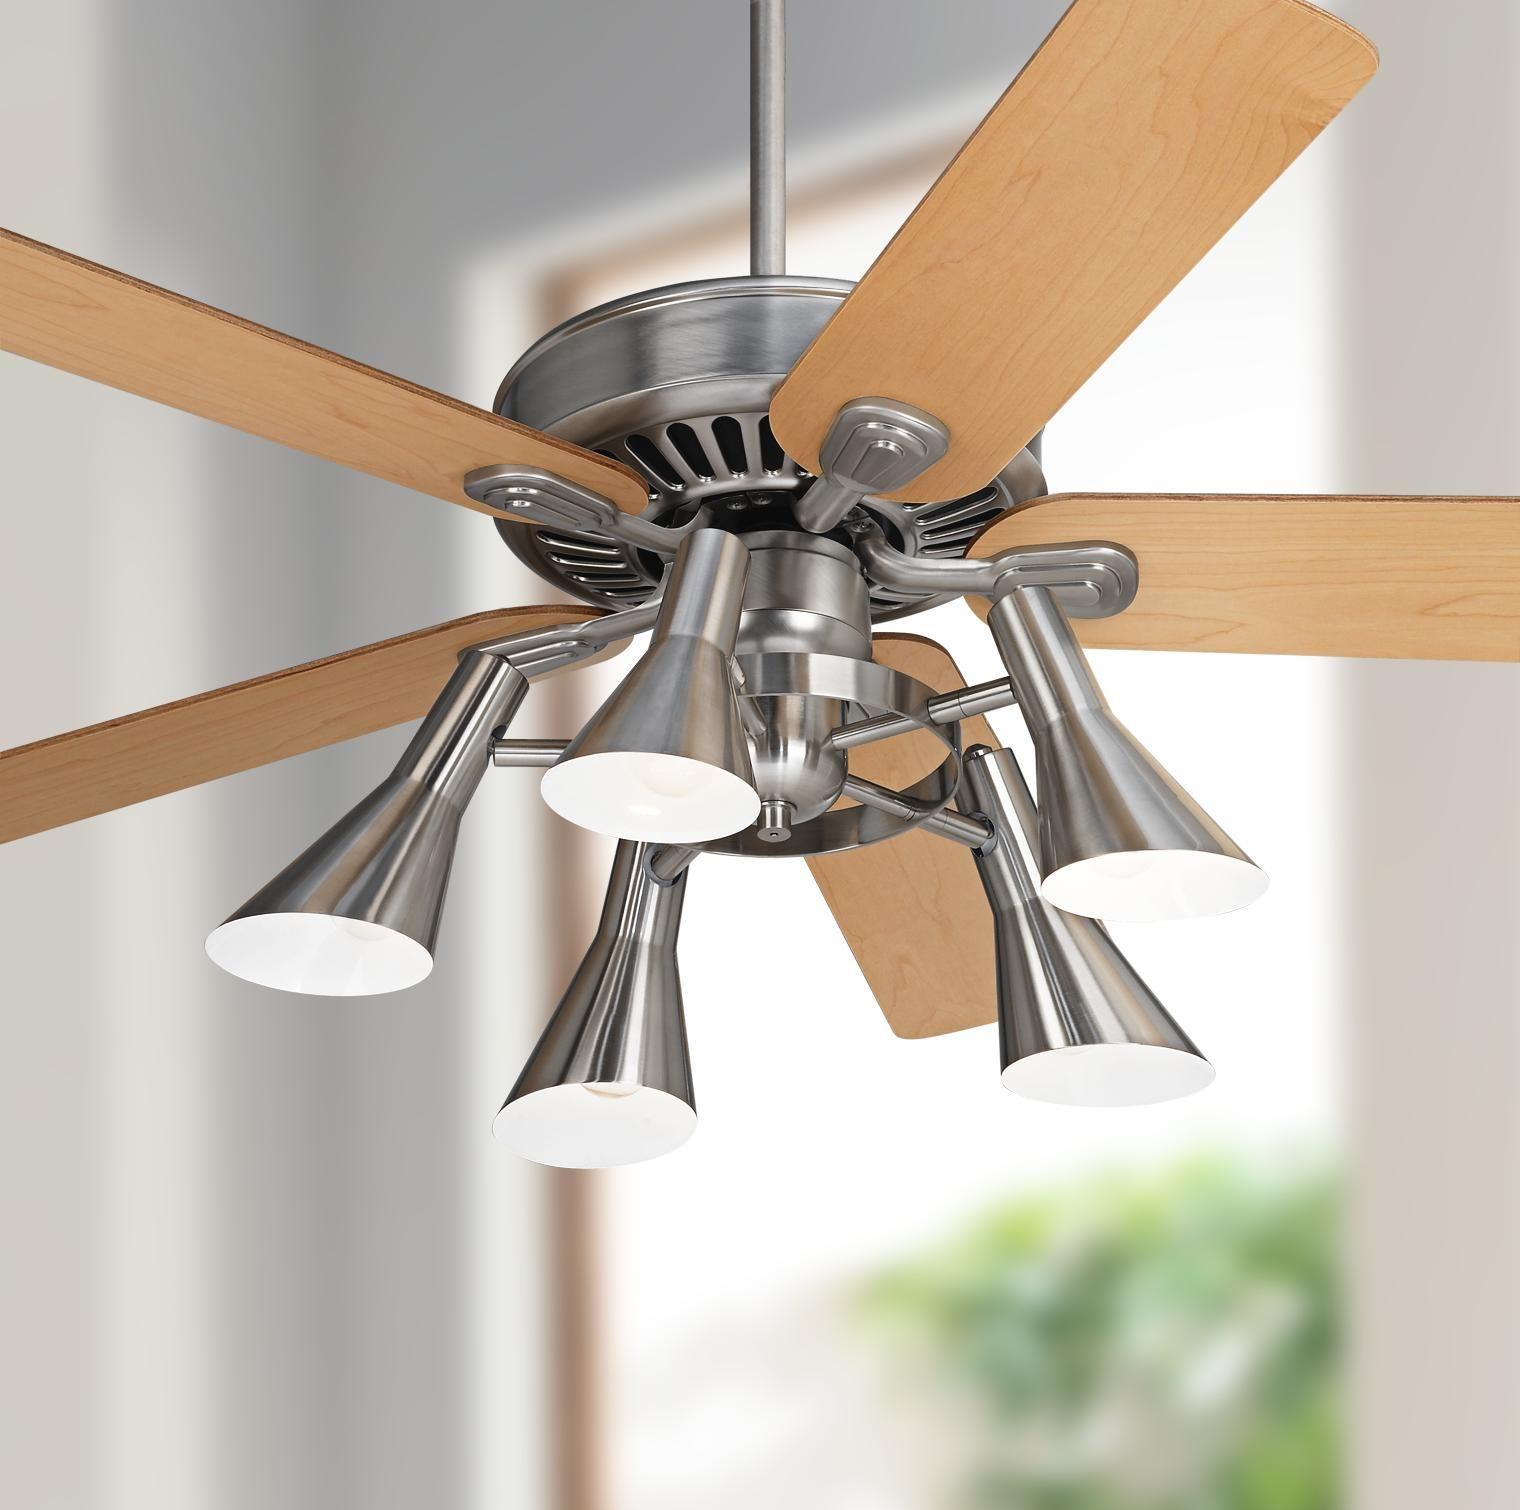 Ceiling Fans 52 Windstar Ii Maple Retro 5 Light Led Ceiling Fan In 2020 Ceiling Fan Led Ceiling Fan Contemporary Ceiling Fans